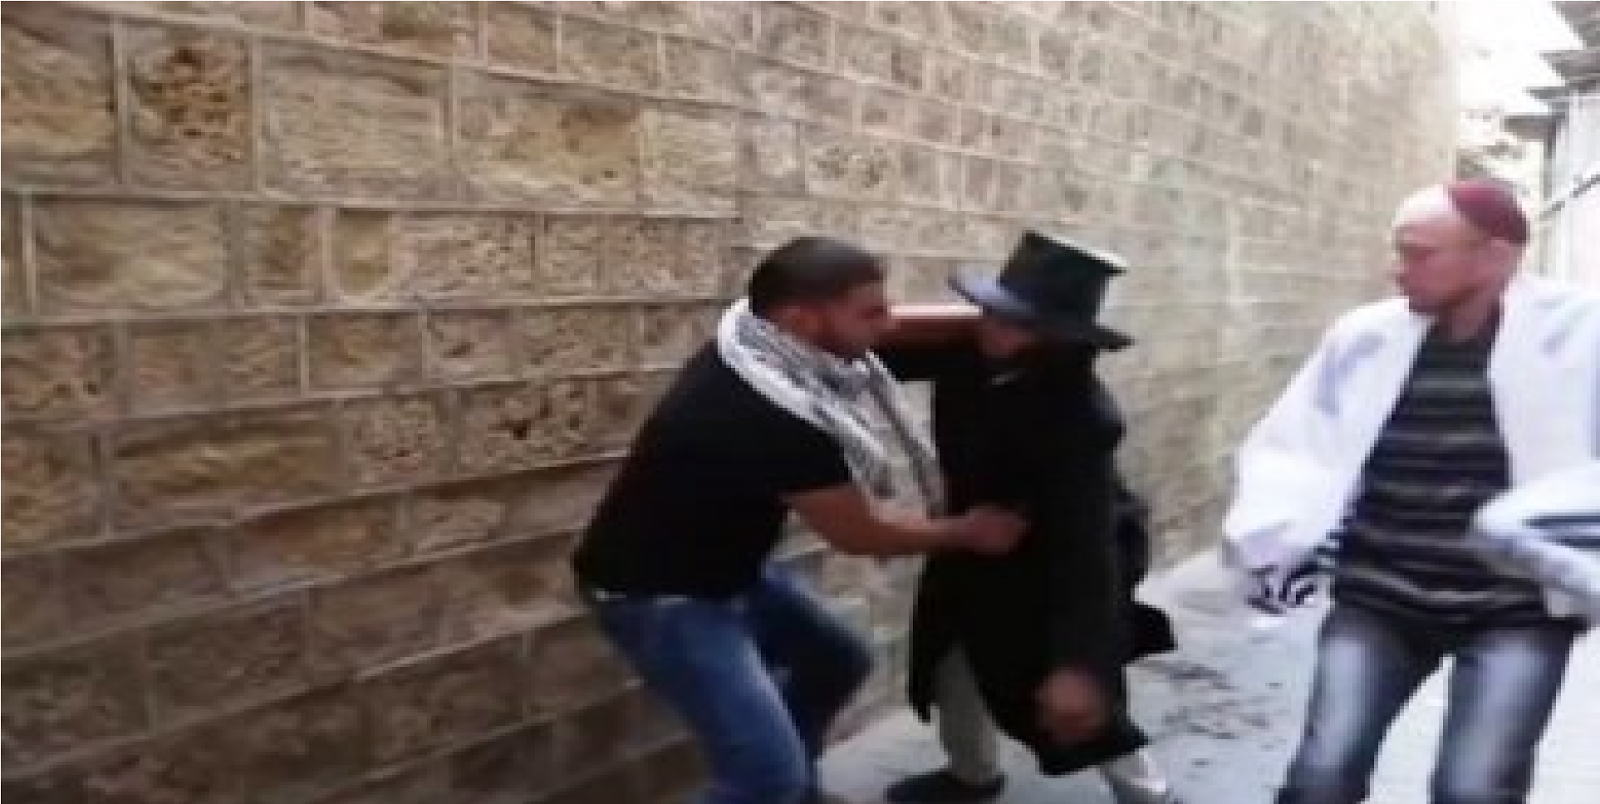 Terroristas De Hamas Utiliza Youtube Para Enseñar A Matar Jóvenes Judíos